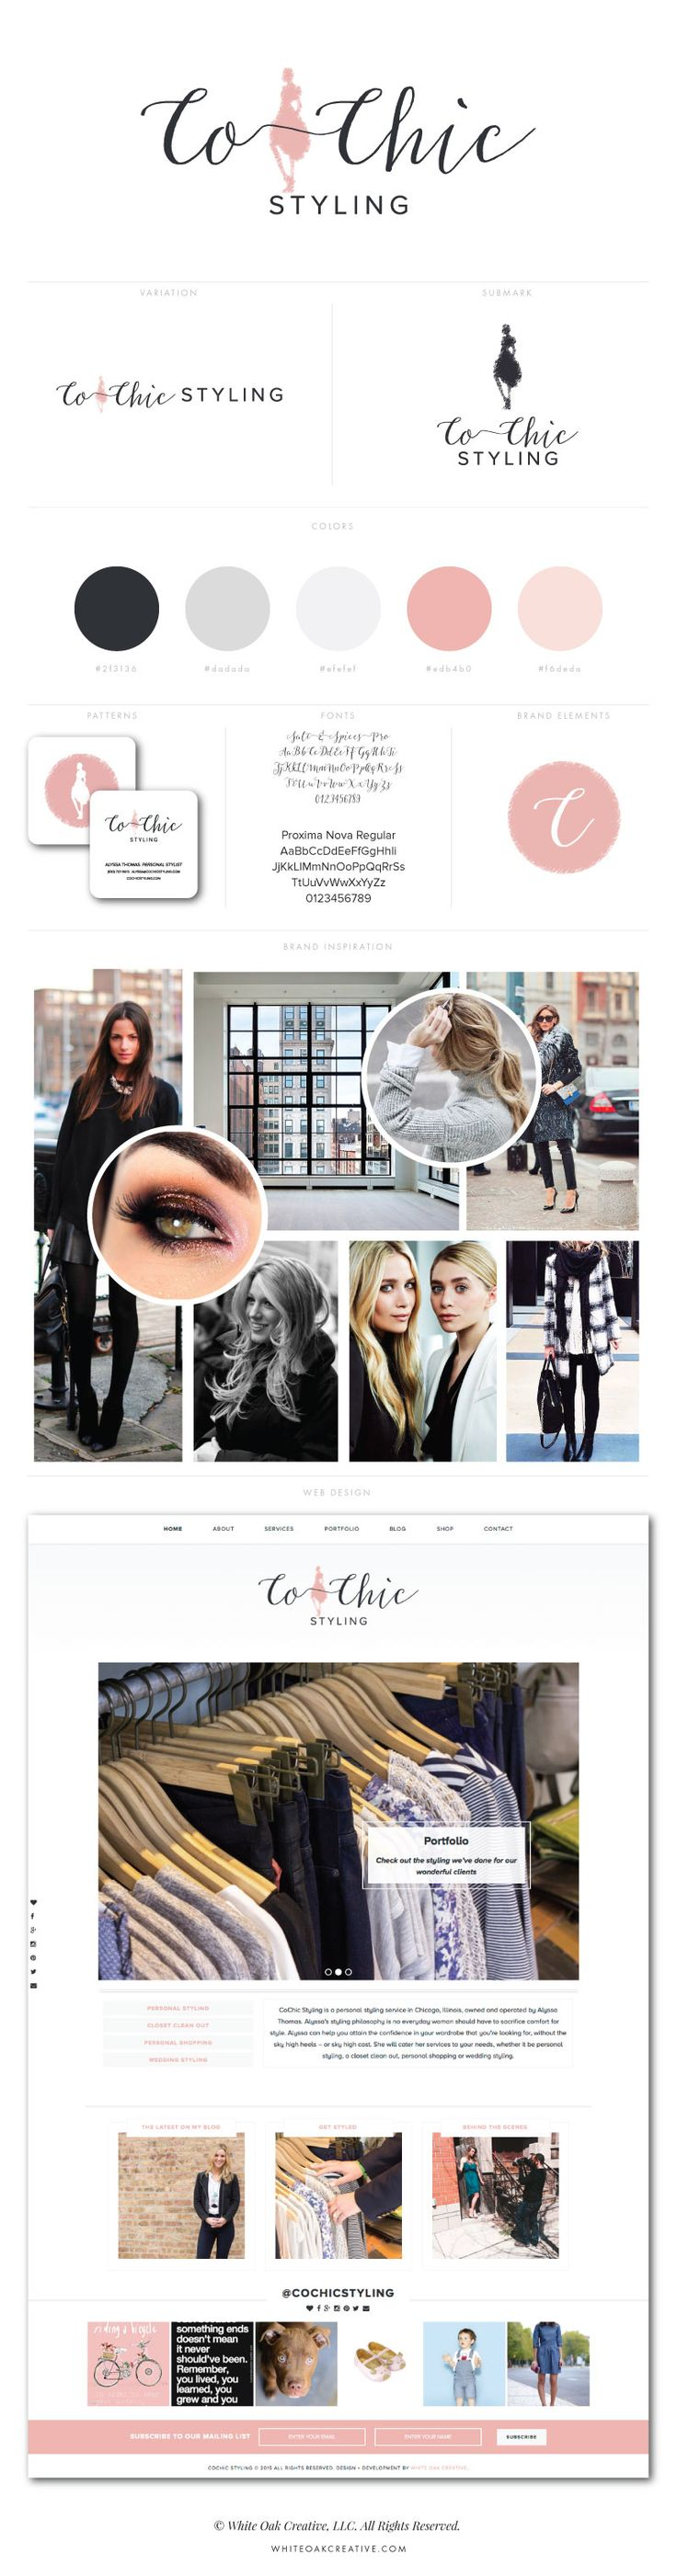 branding and web design for stylist - graphic design, mood board inspiration, web designer, blog design, logo identity, brand strategy, branding